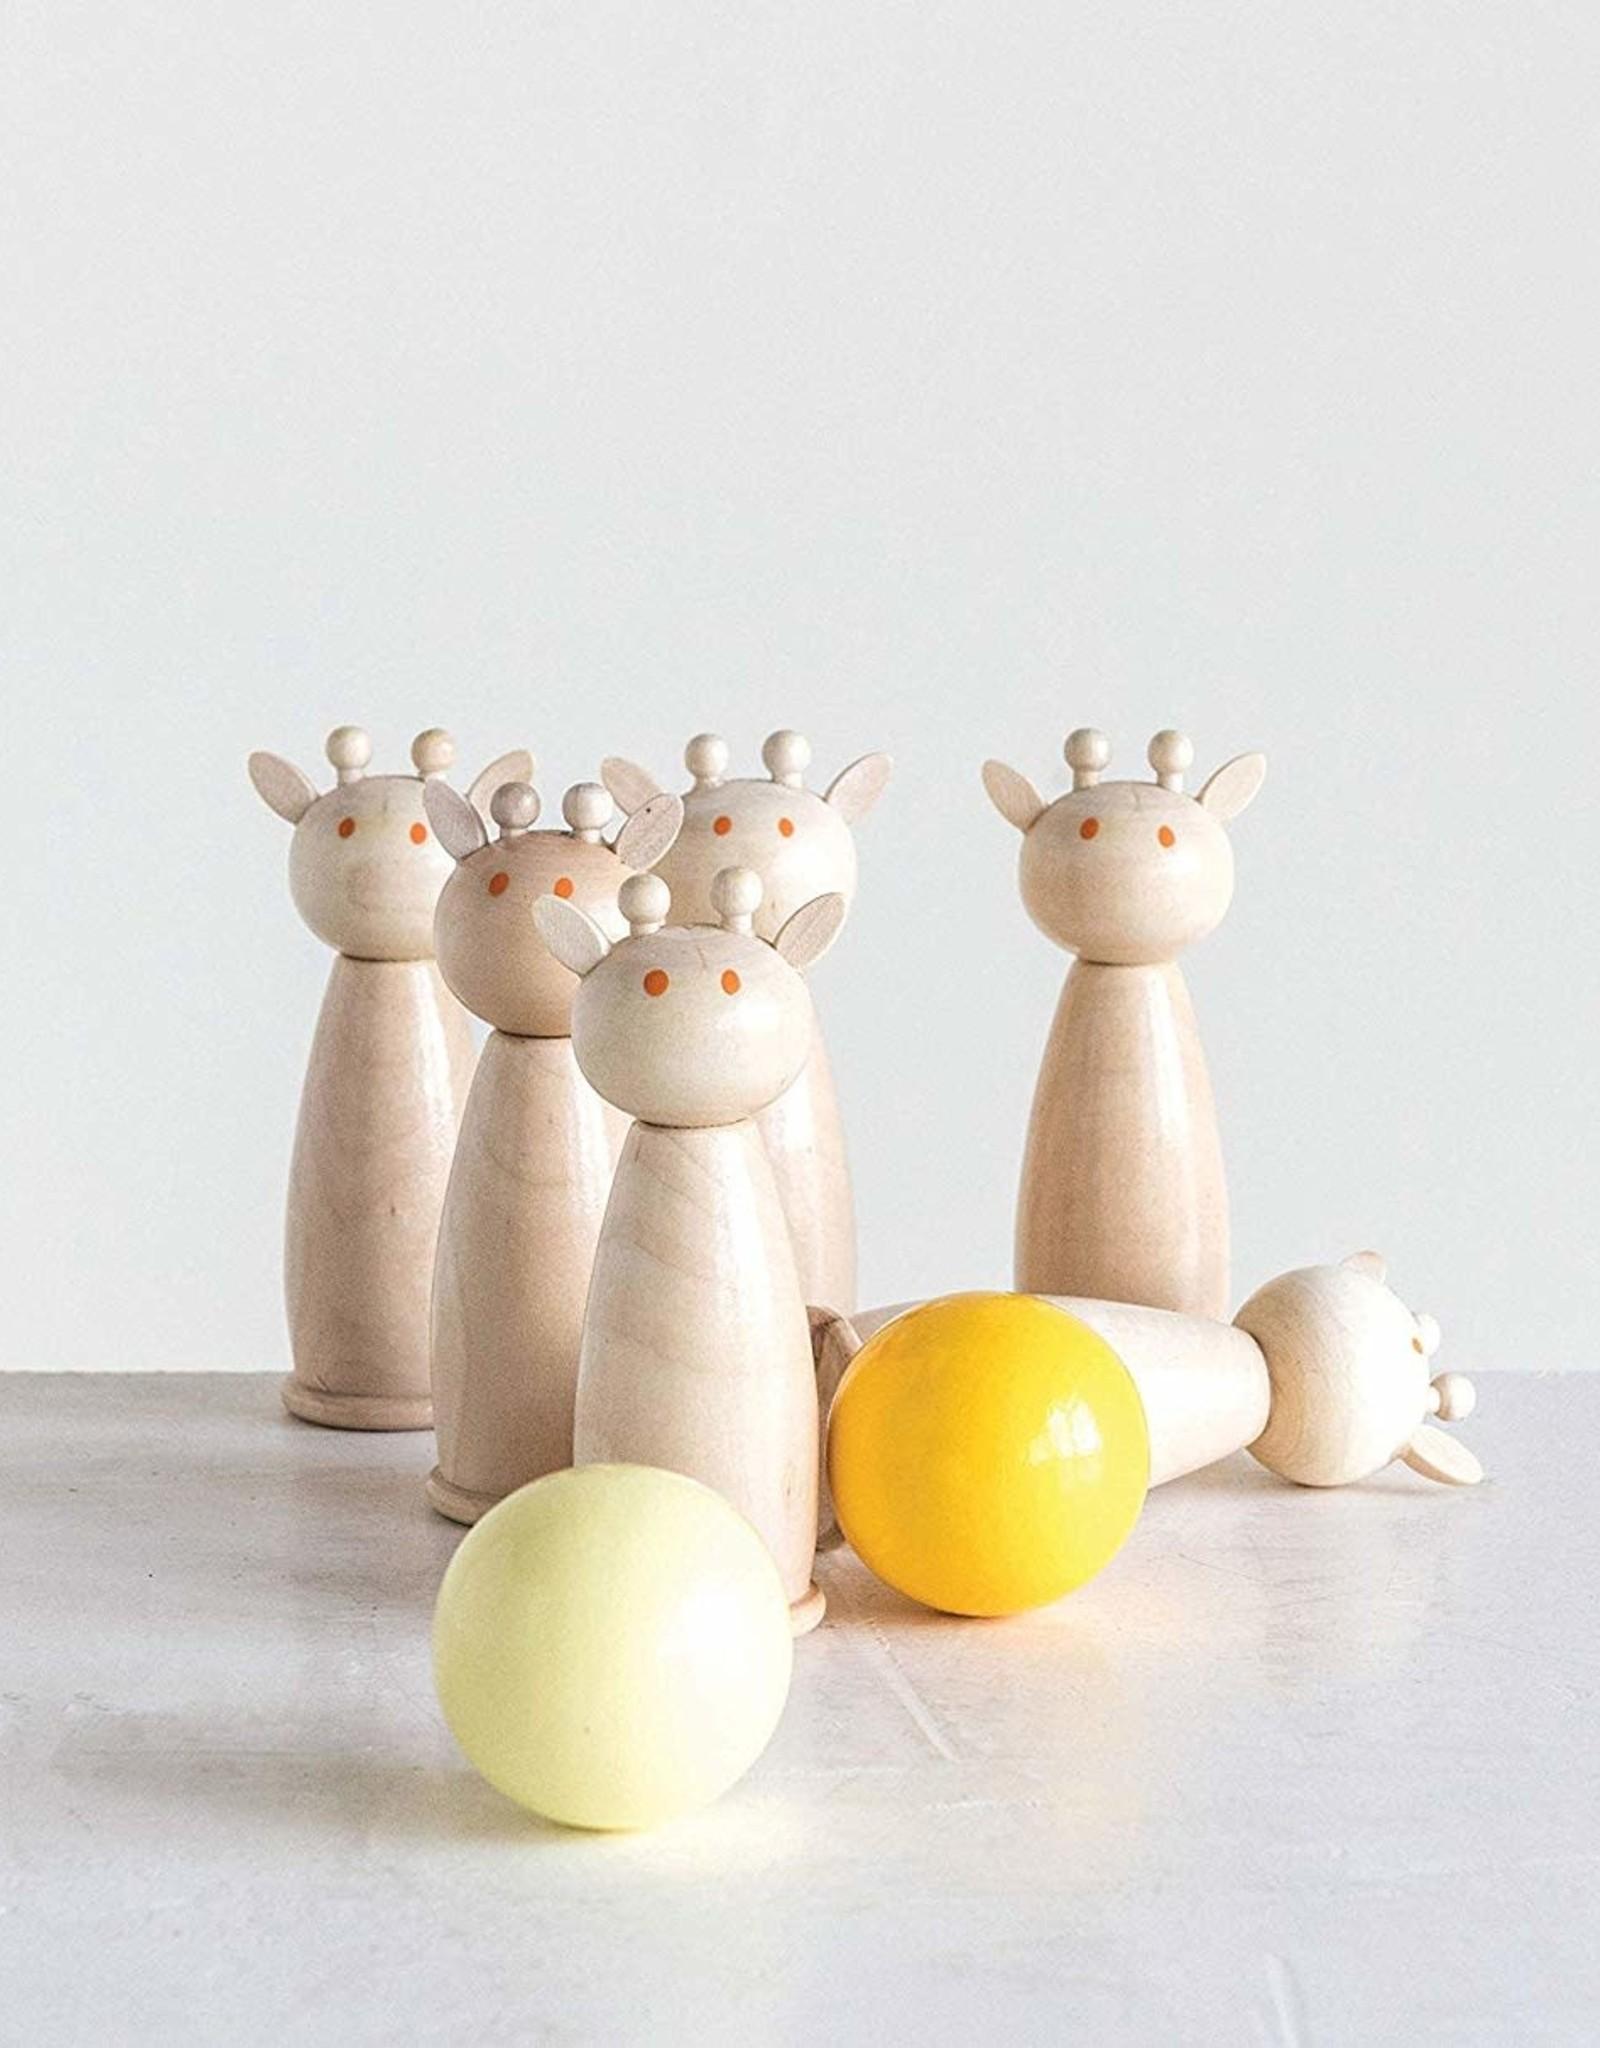 Jeu de quilles de girafe en bois